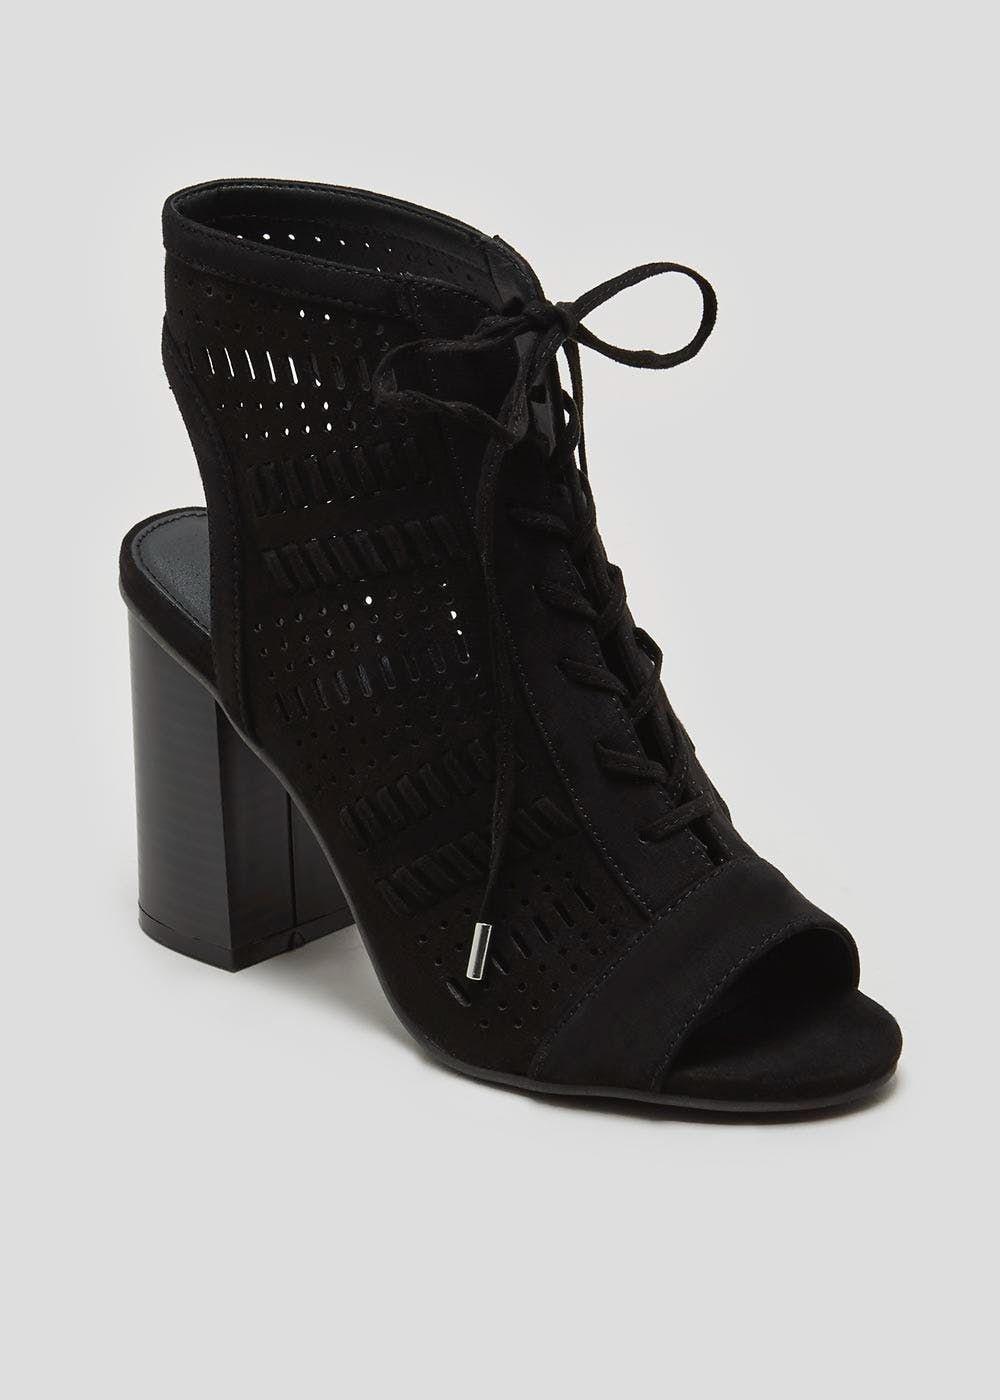 bdafe07d4 Whipstitch Shoe Boots – Black | Shoes | Shoe boots, Boots, Shoes